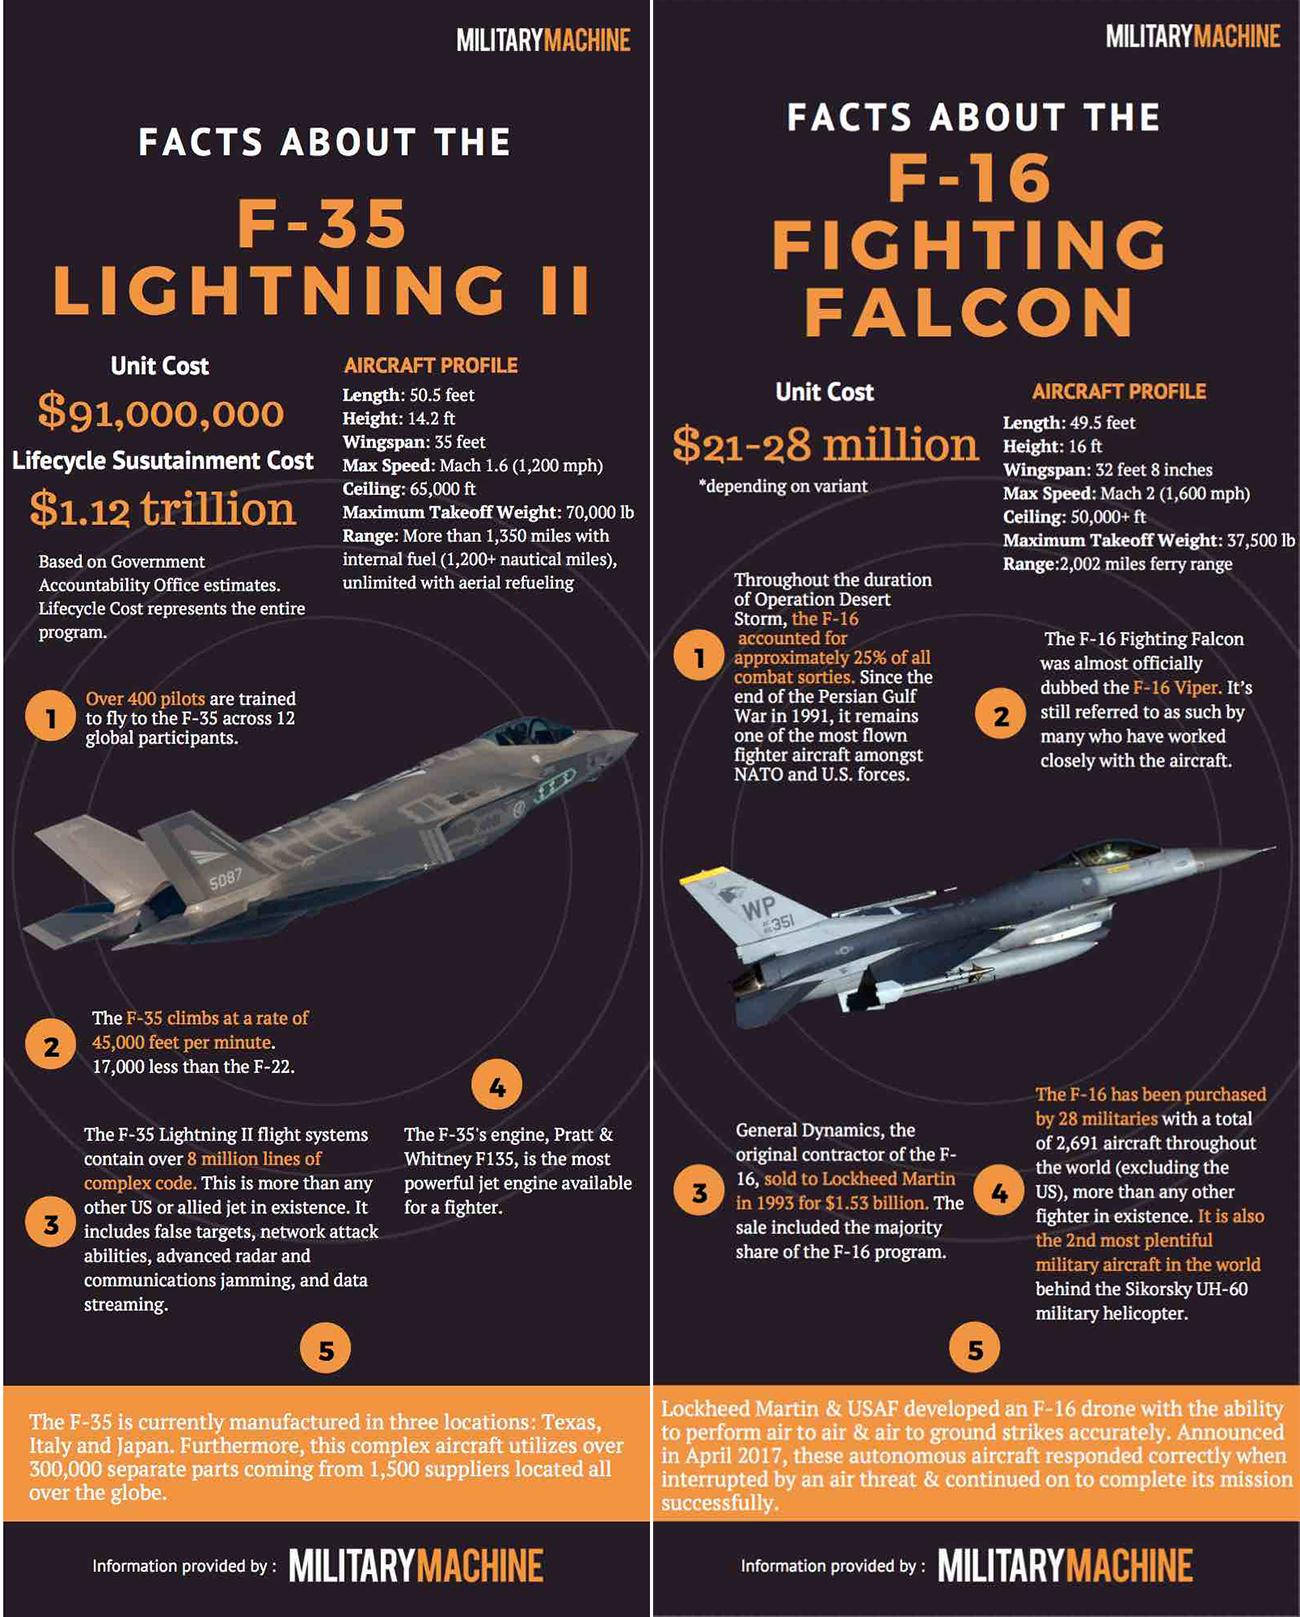 F-35 Lightning II vs F-16 Fighting Falcon | Military Machine